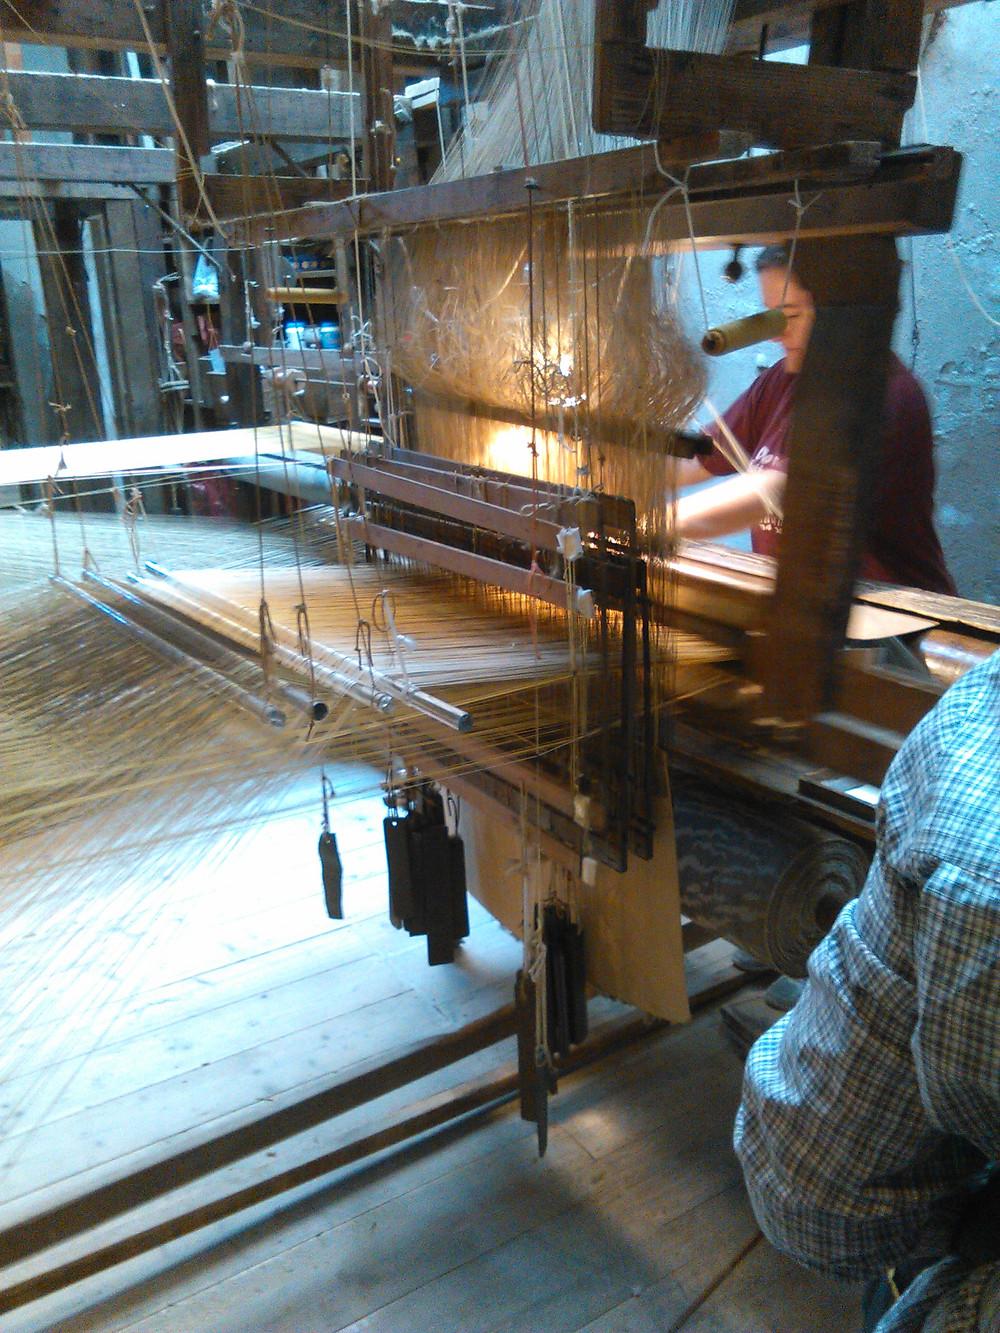 A Master Velvet Weaver, Bevilacqua, Venice